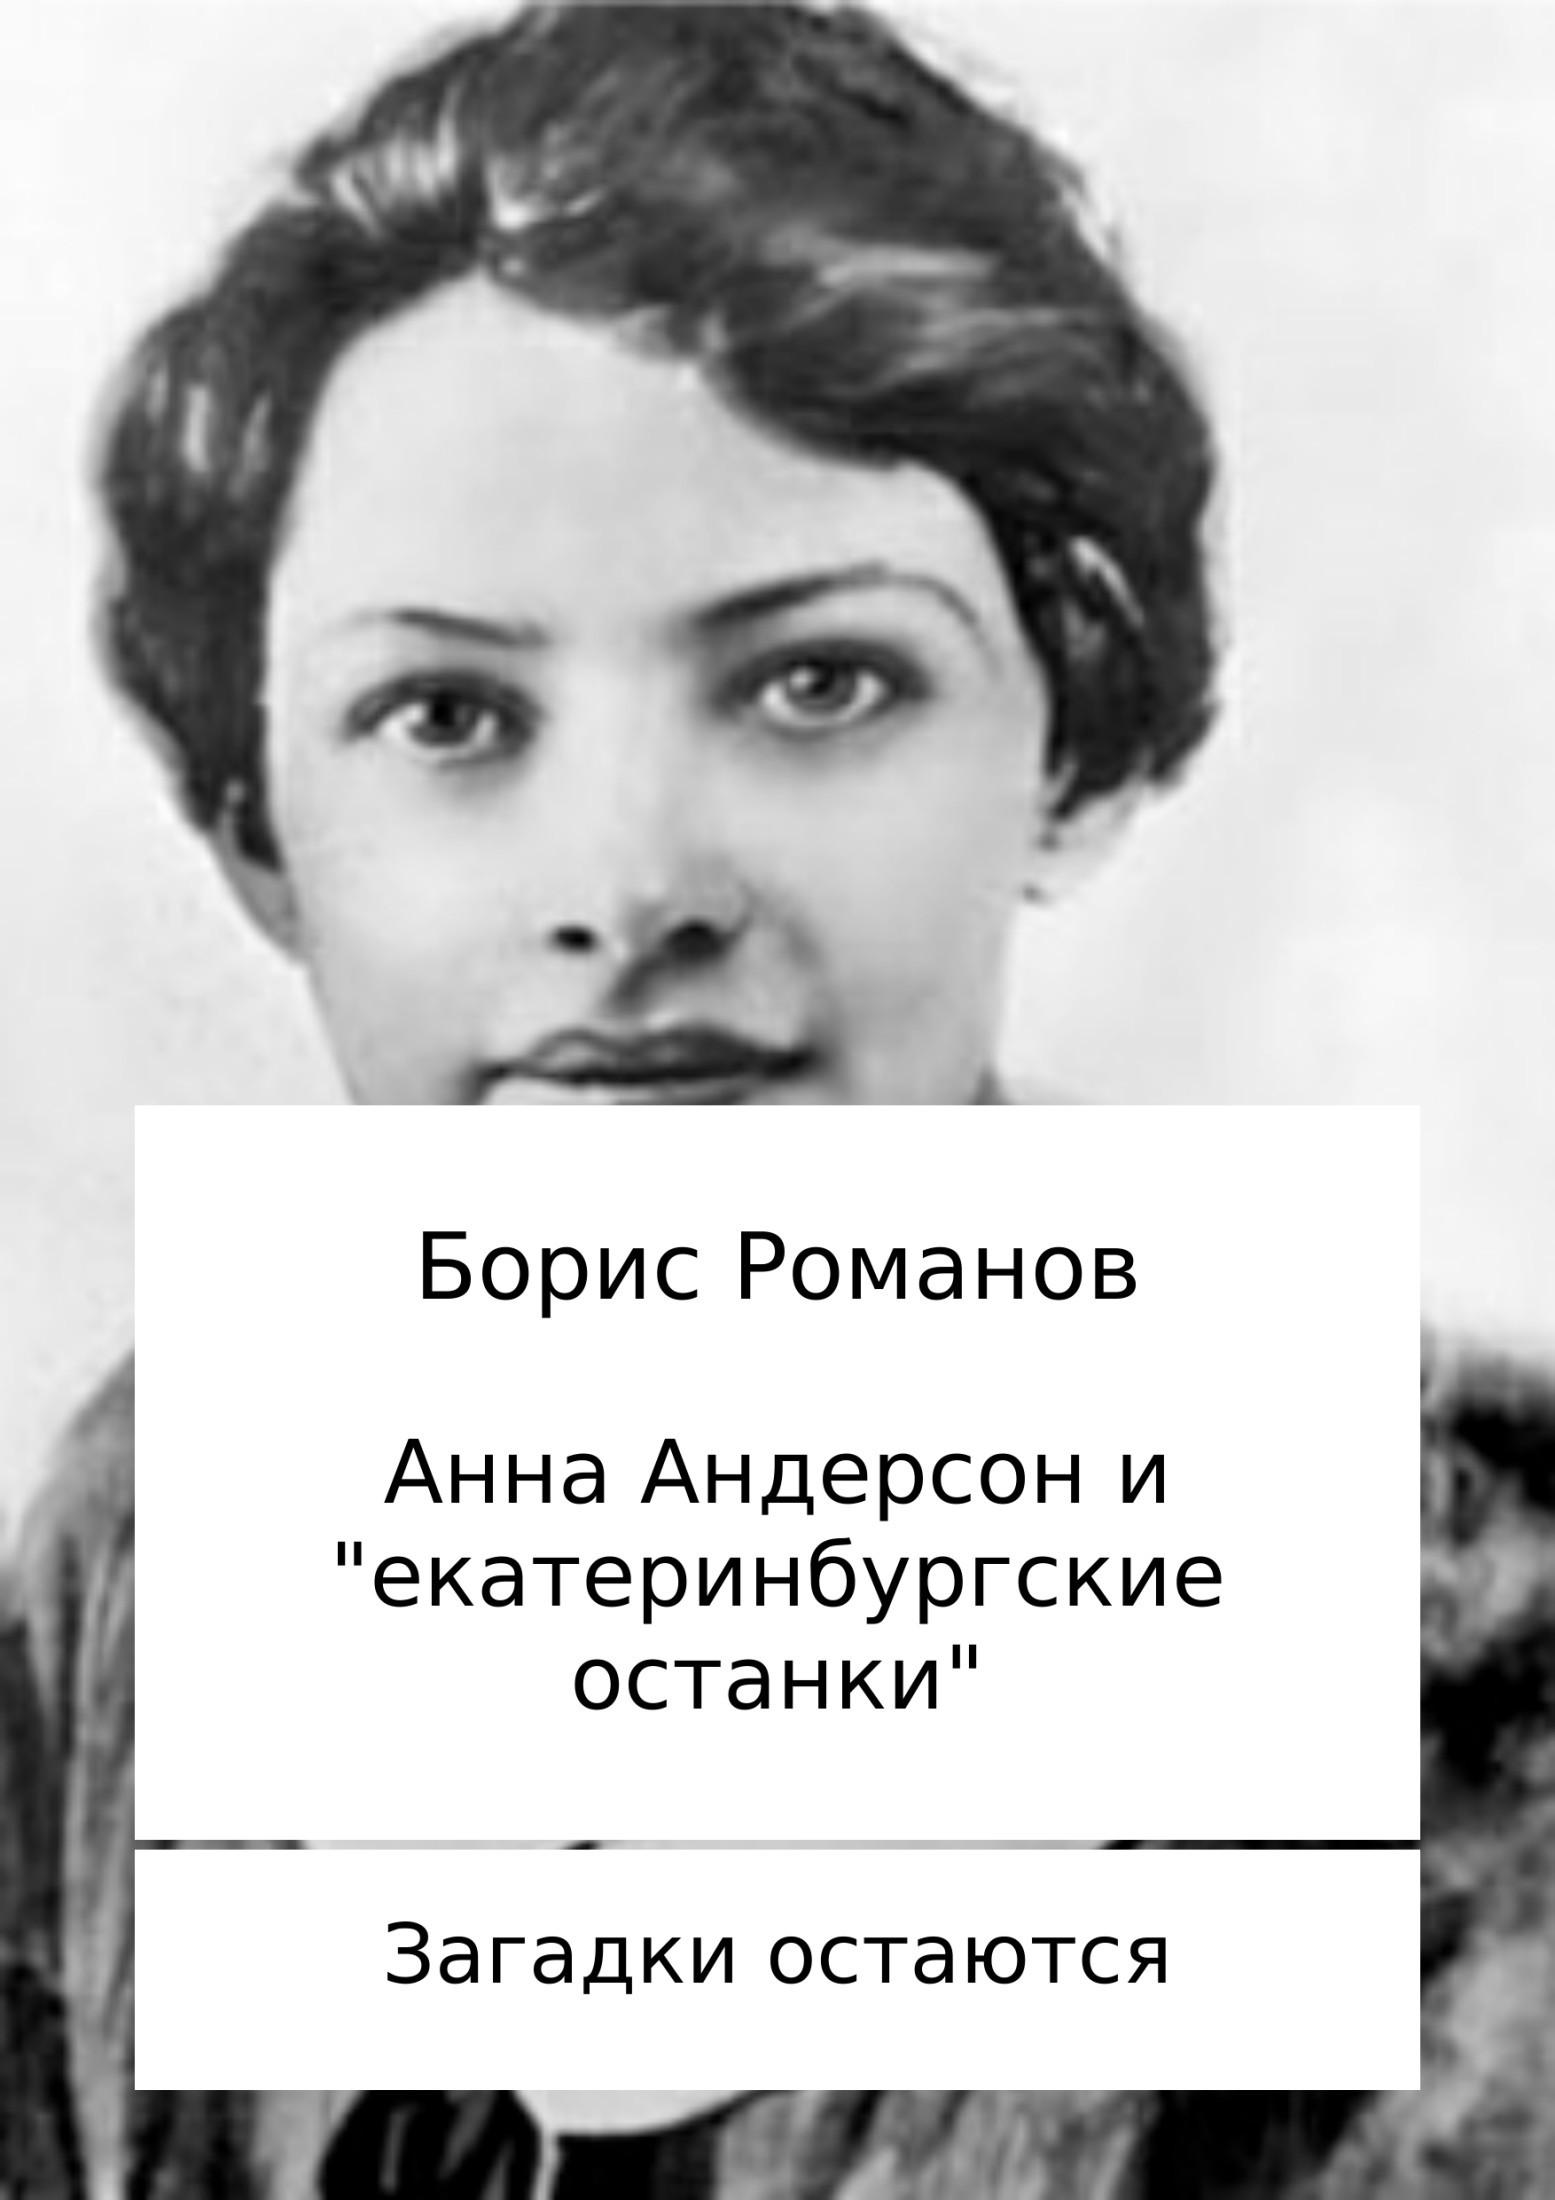 Борис Романов Анна Андерсон и «екатеринбургские останки»